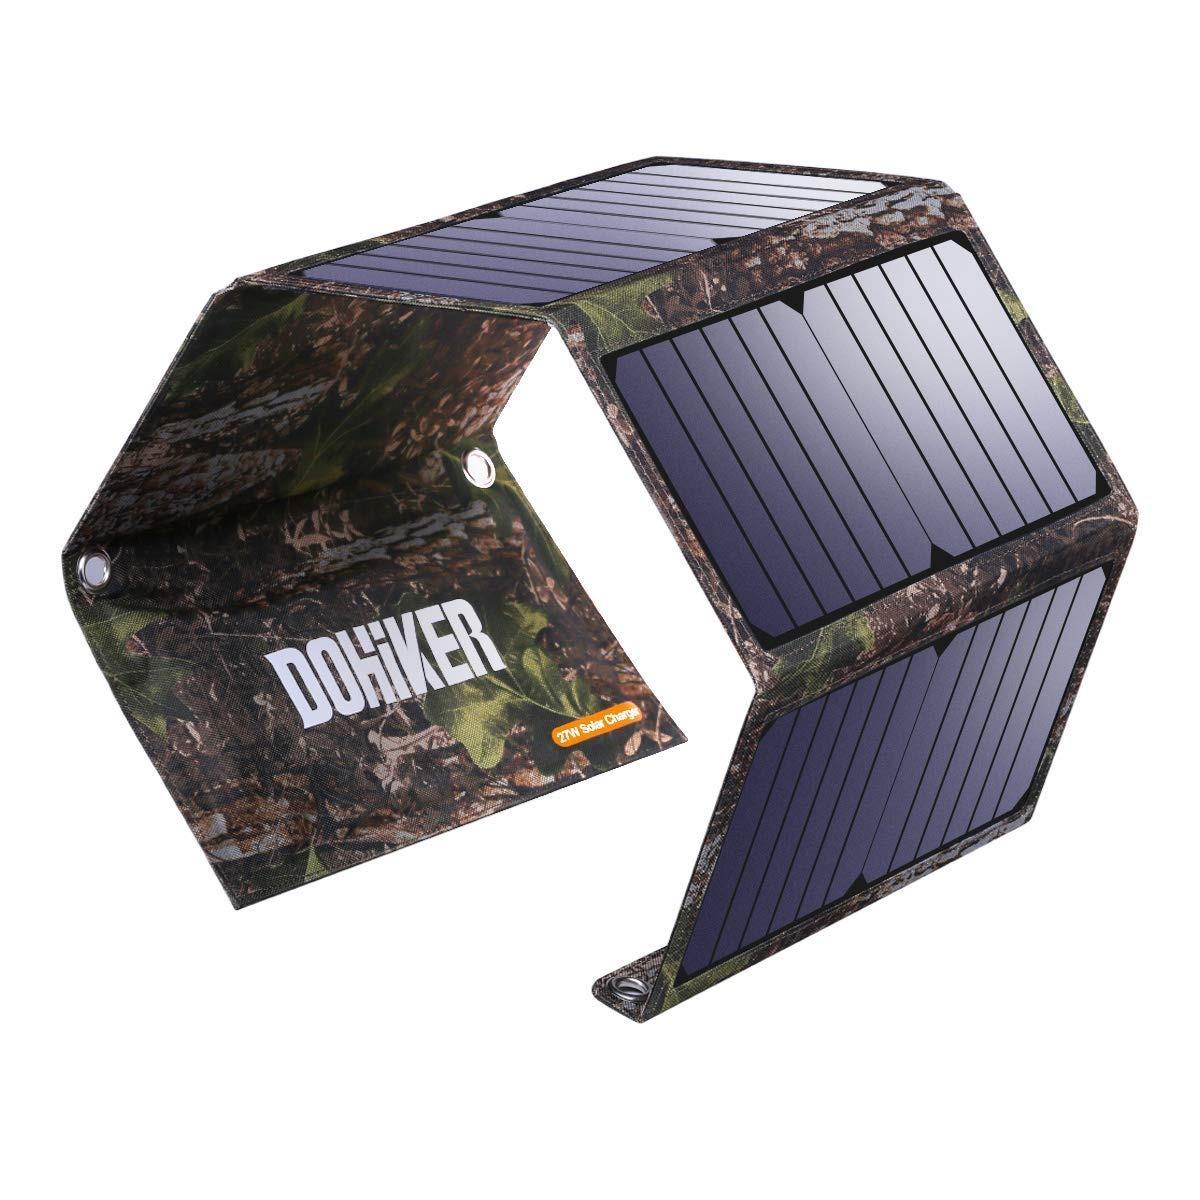 Dohiker panel solar chollo